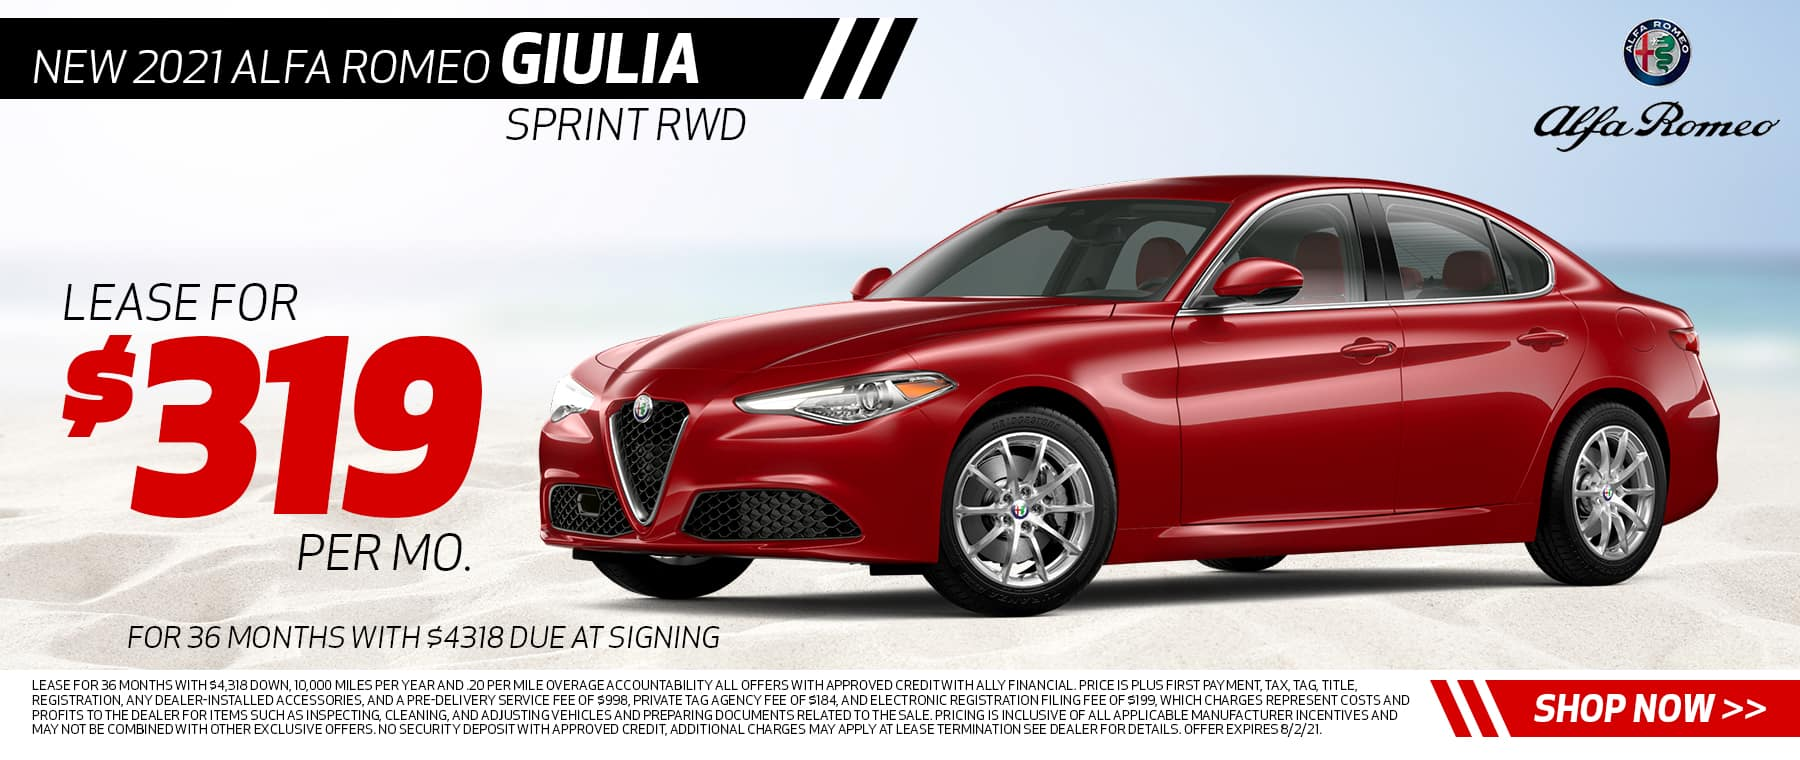 New 2021 Alfa Romeo Giulia Sprint RWD